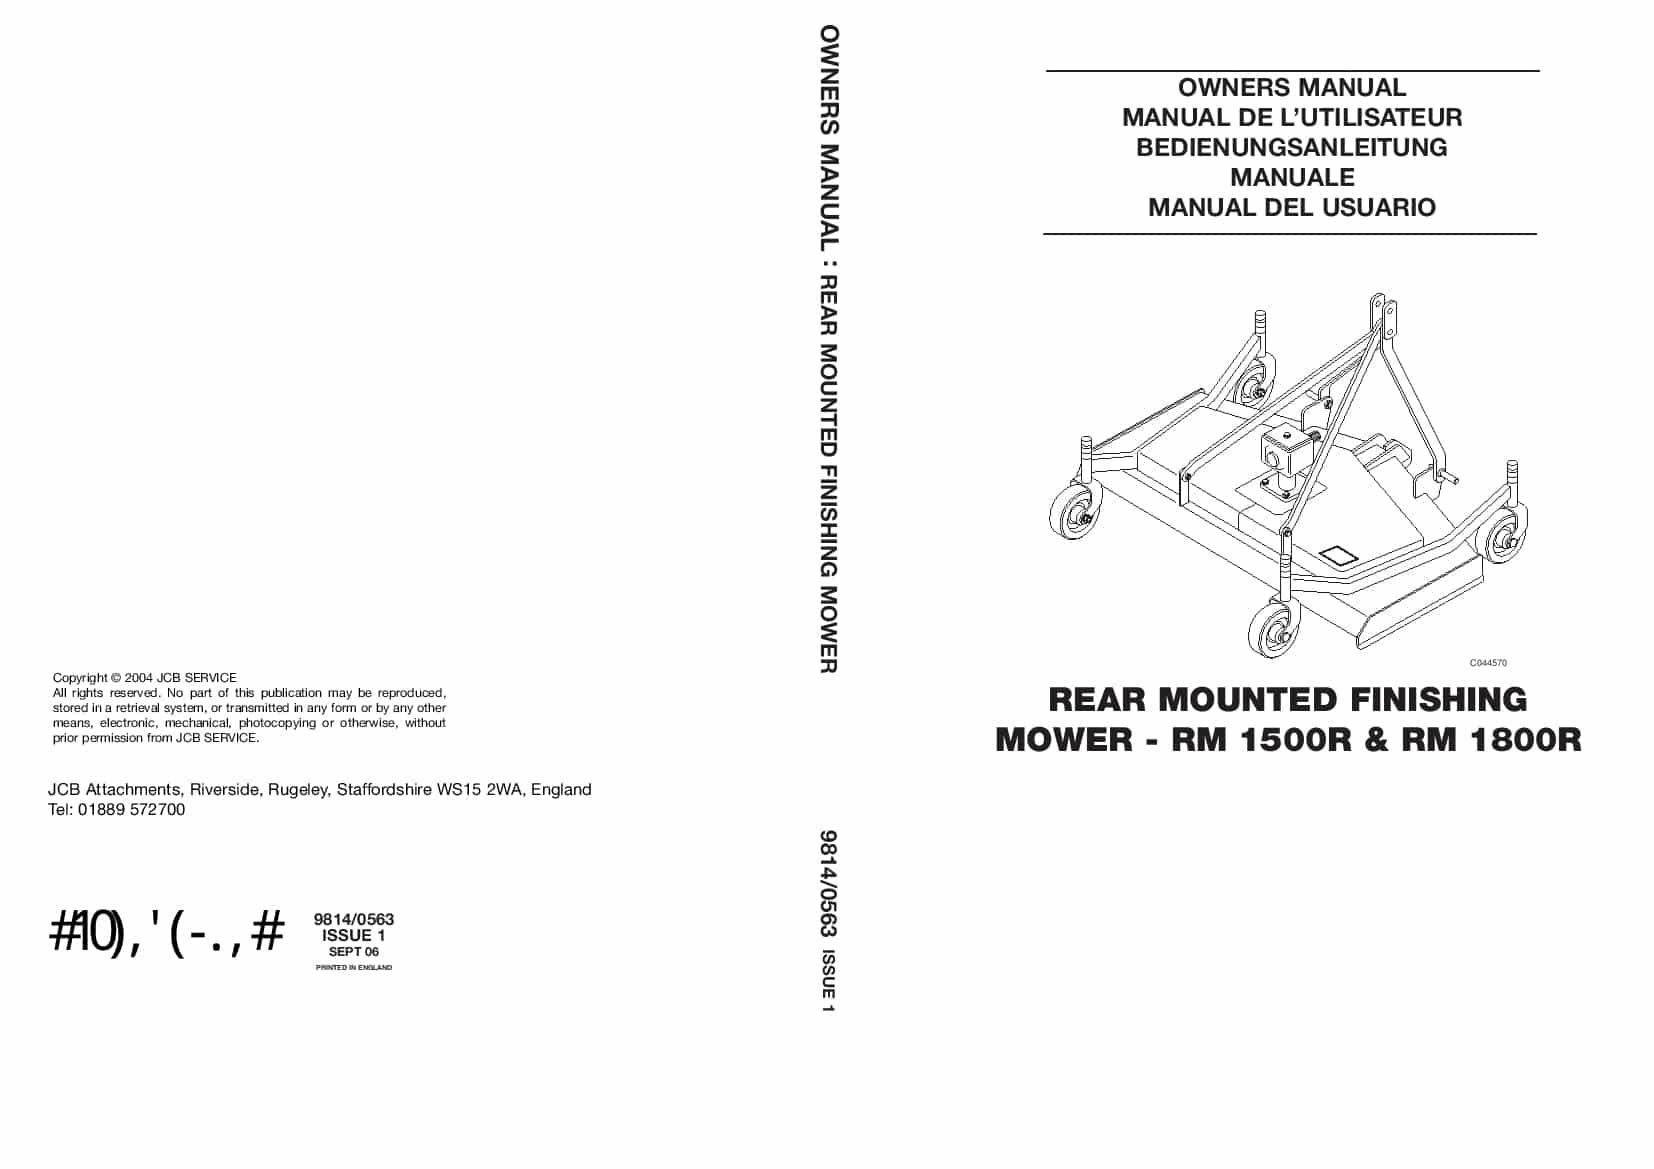 JCB MOWER RM 1500R, RM 1800R Operation and Maintenance